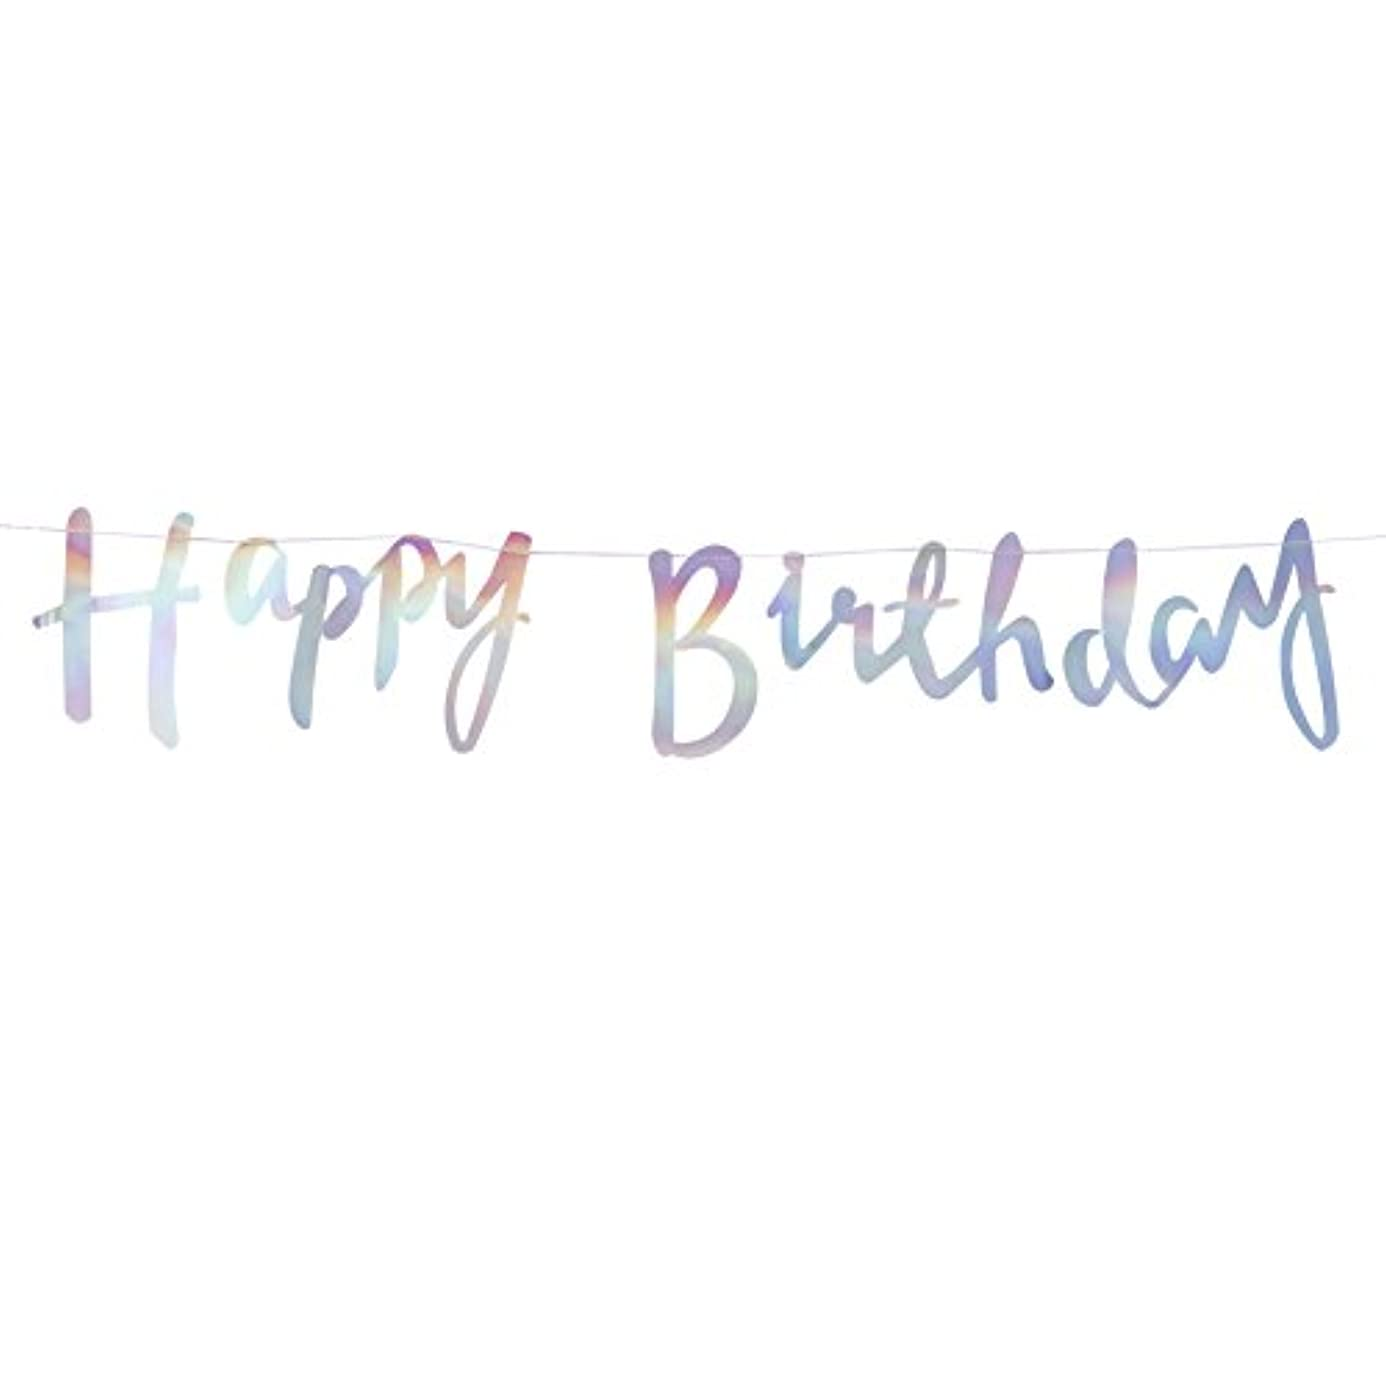 Ginger Ray Iridescent Holographic Rainbow Designer Happy Birthday Bunting Banner Decoration - Iridescent Party svs9010361